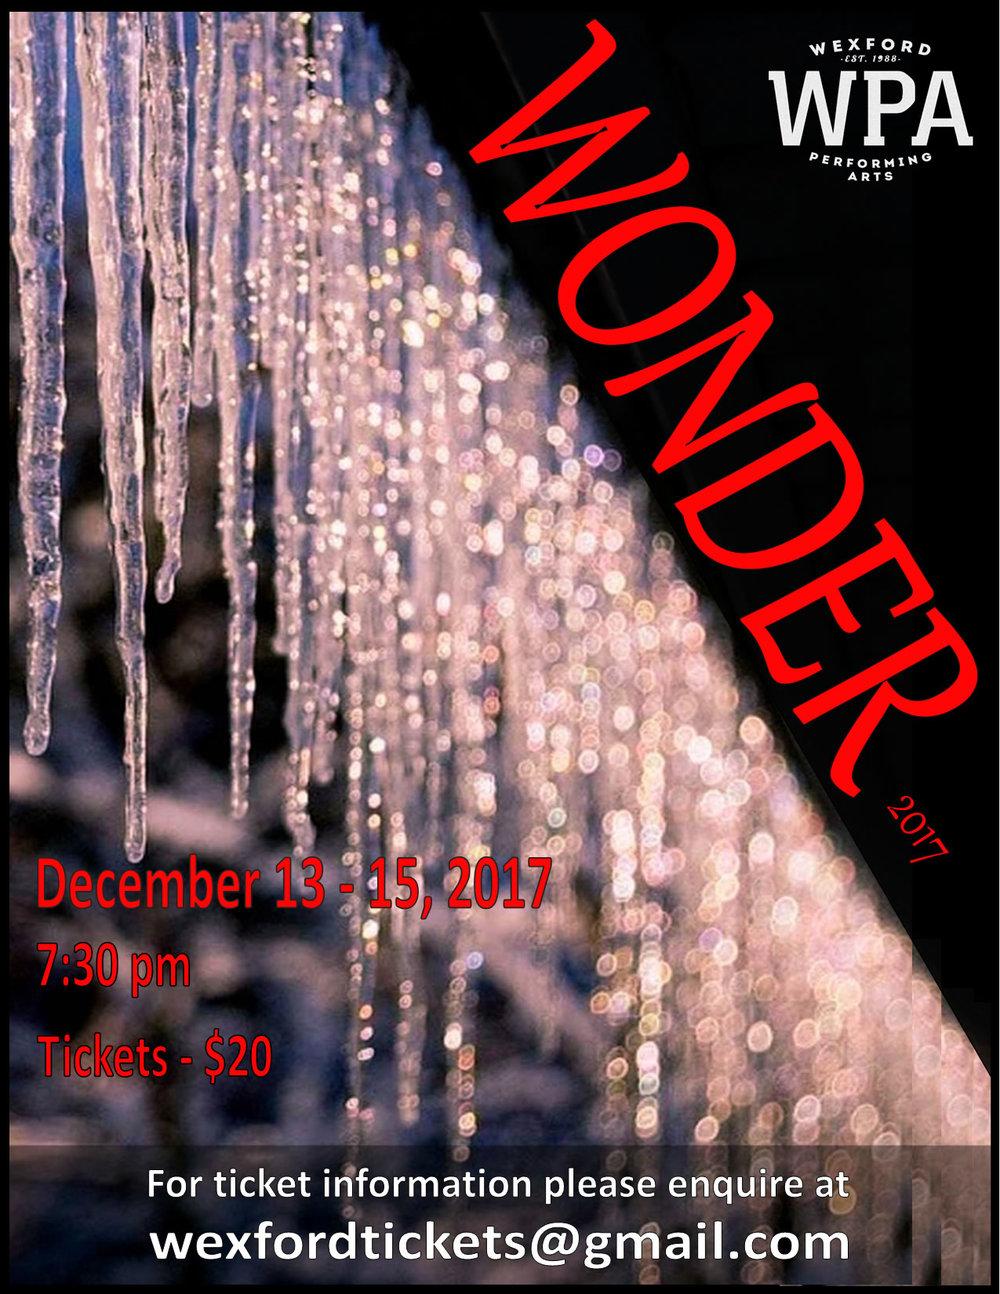 Wonder 2017 poster.jpg